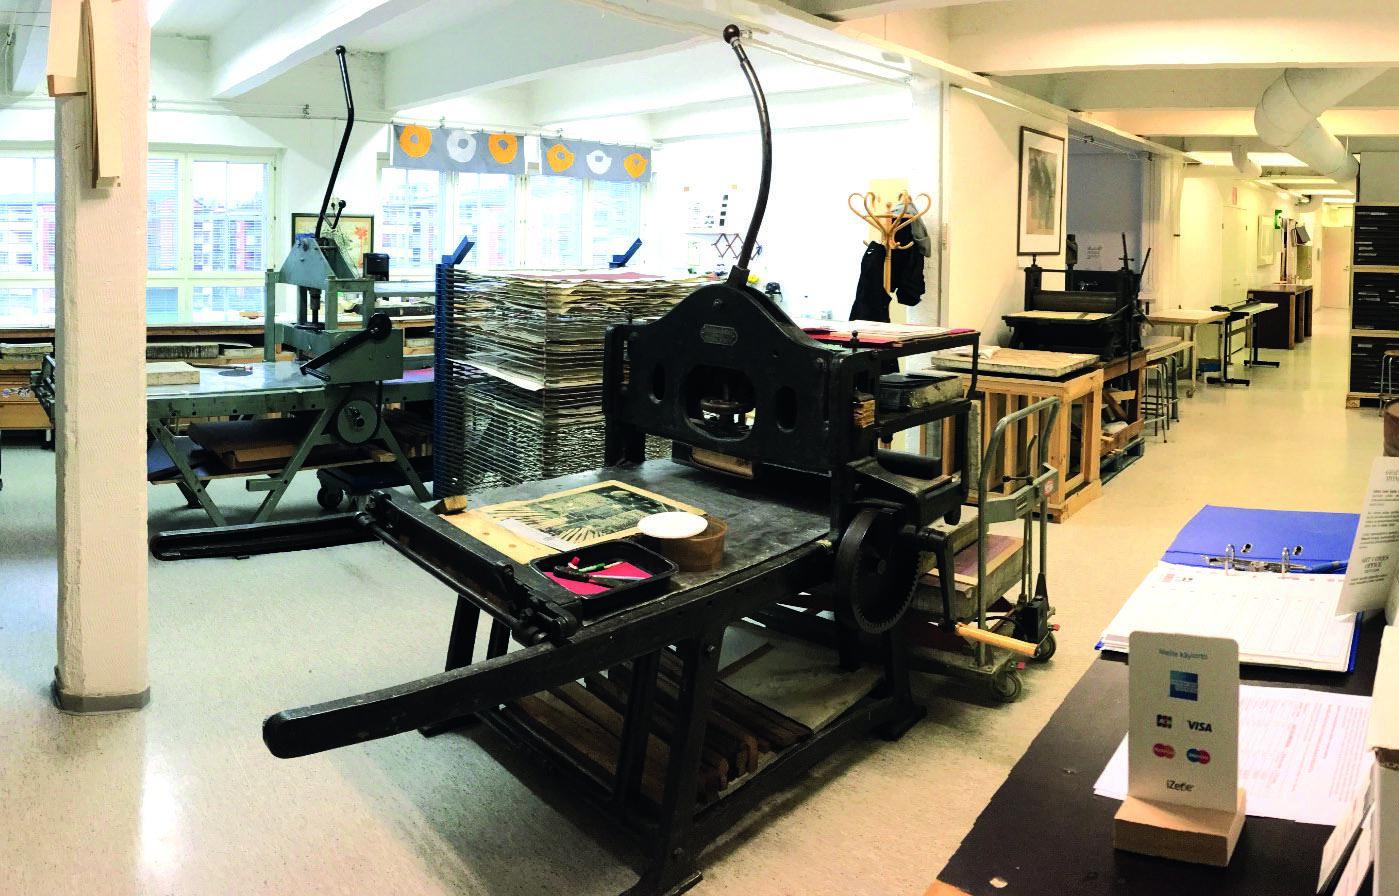 Visit to a traditional printmaking studio